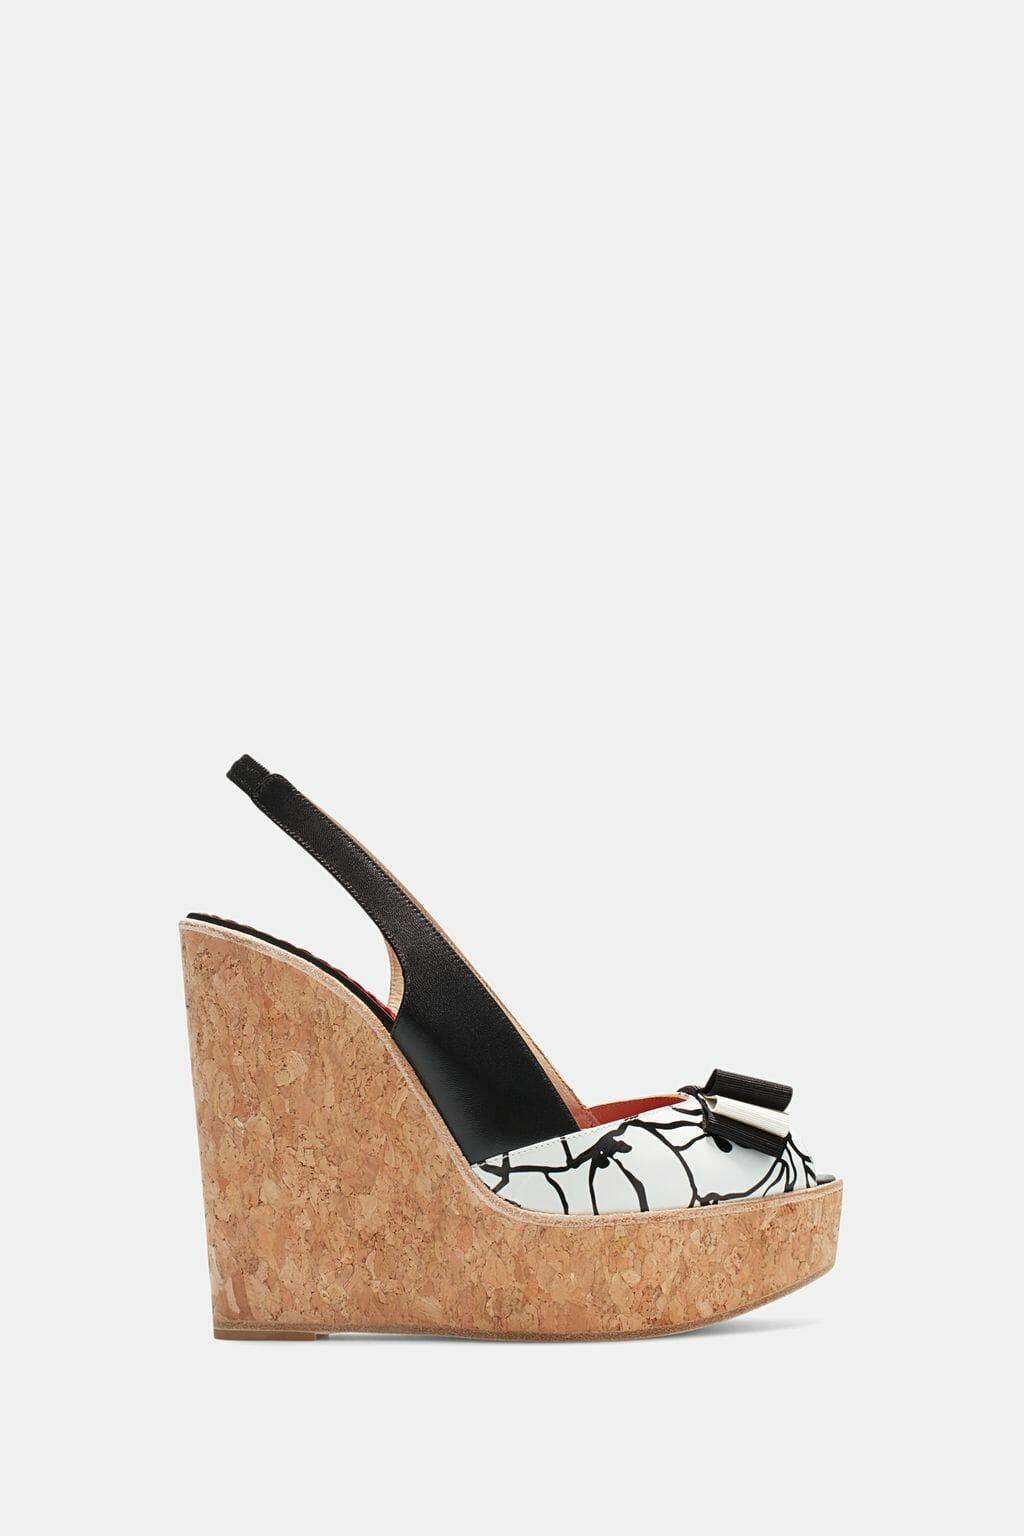 CH-Carolina-herrera-shoes-collection-Spring-Summer-2018-shoe-52